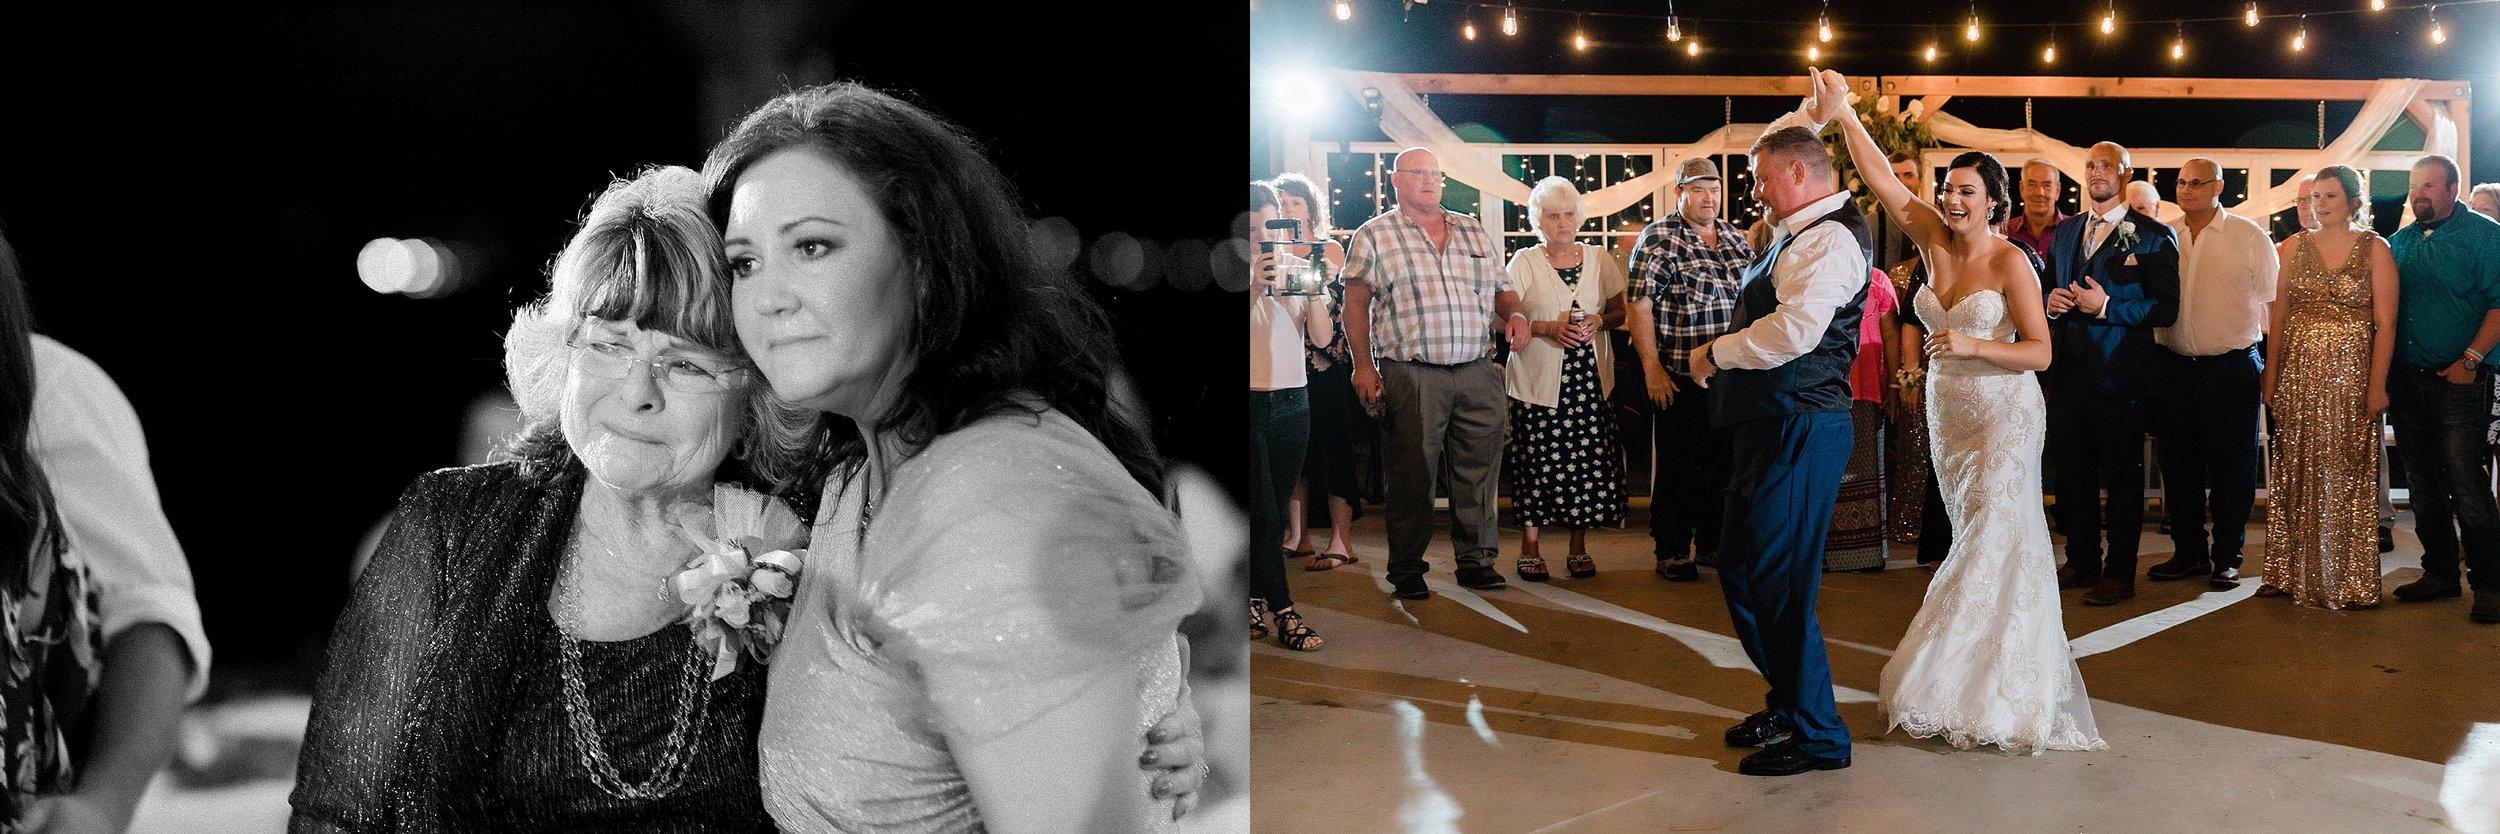 bailey-and-carl-coyote-ranch-resort-wedding-photographer-wichita-falls-texas-destination-wedding-0064.jpg